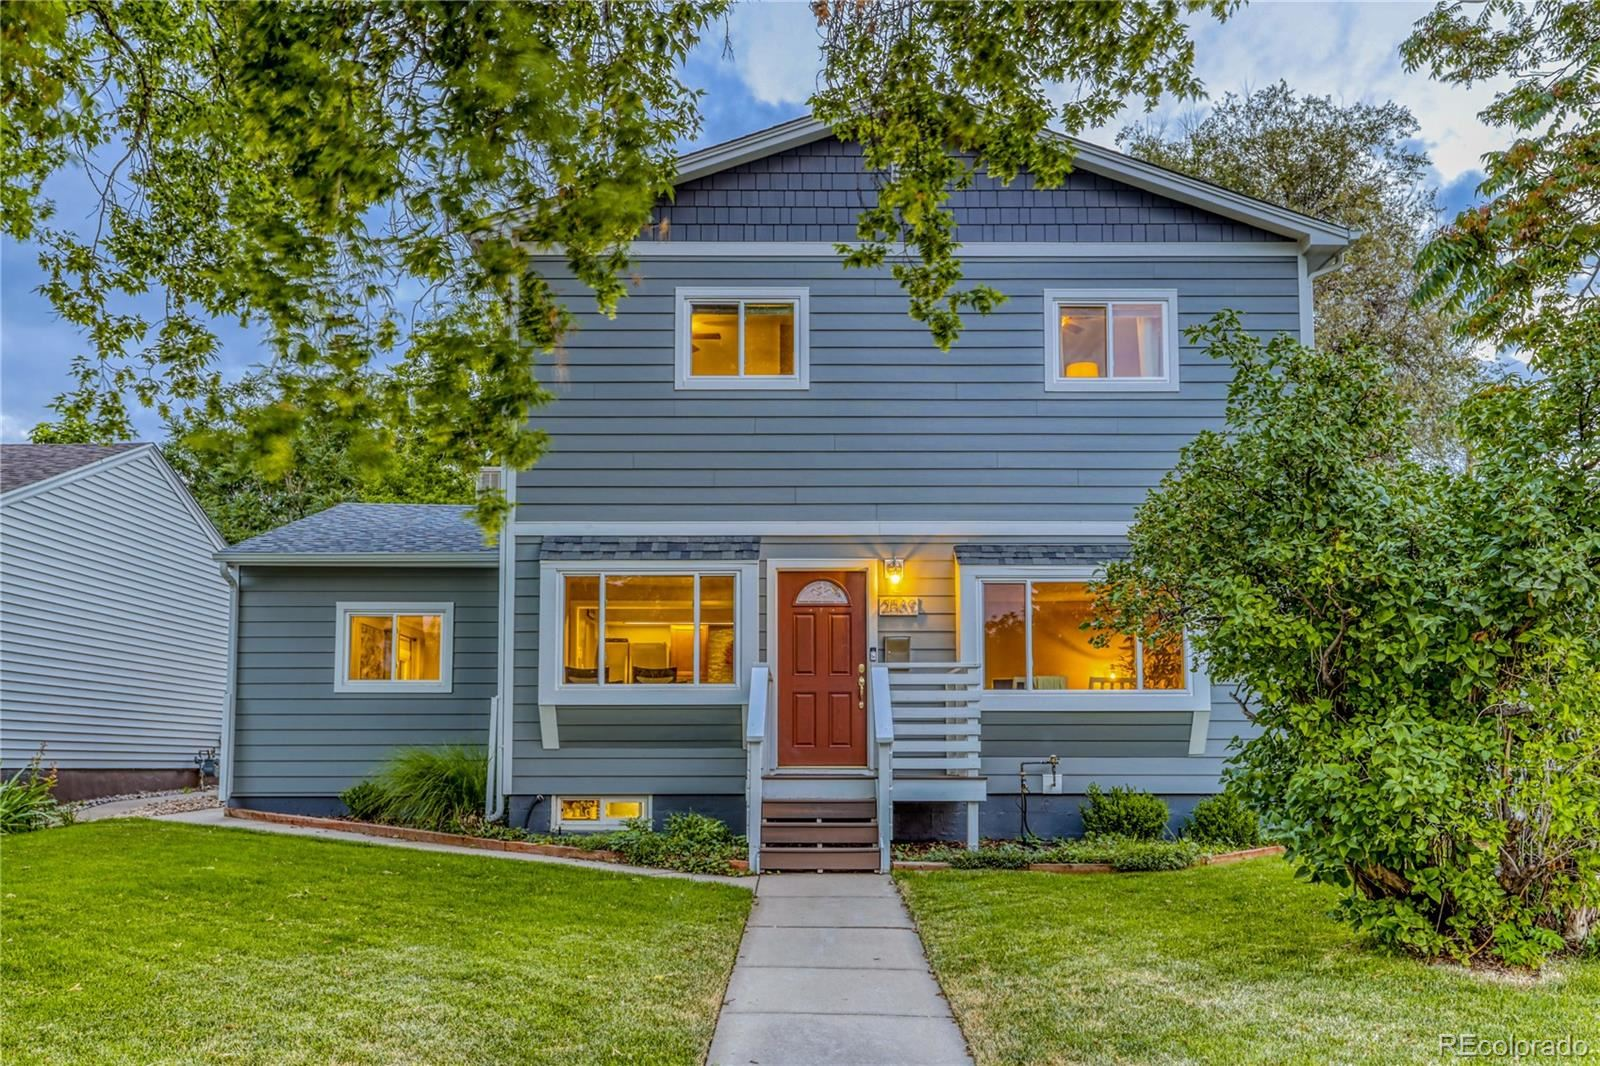 2569 Harlan Street, Edgewater, CO 80214 - #: 8989845